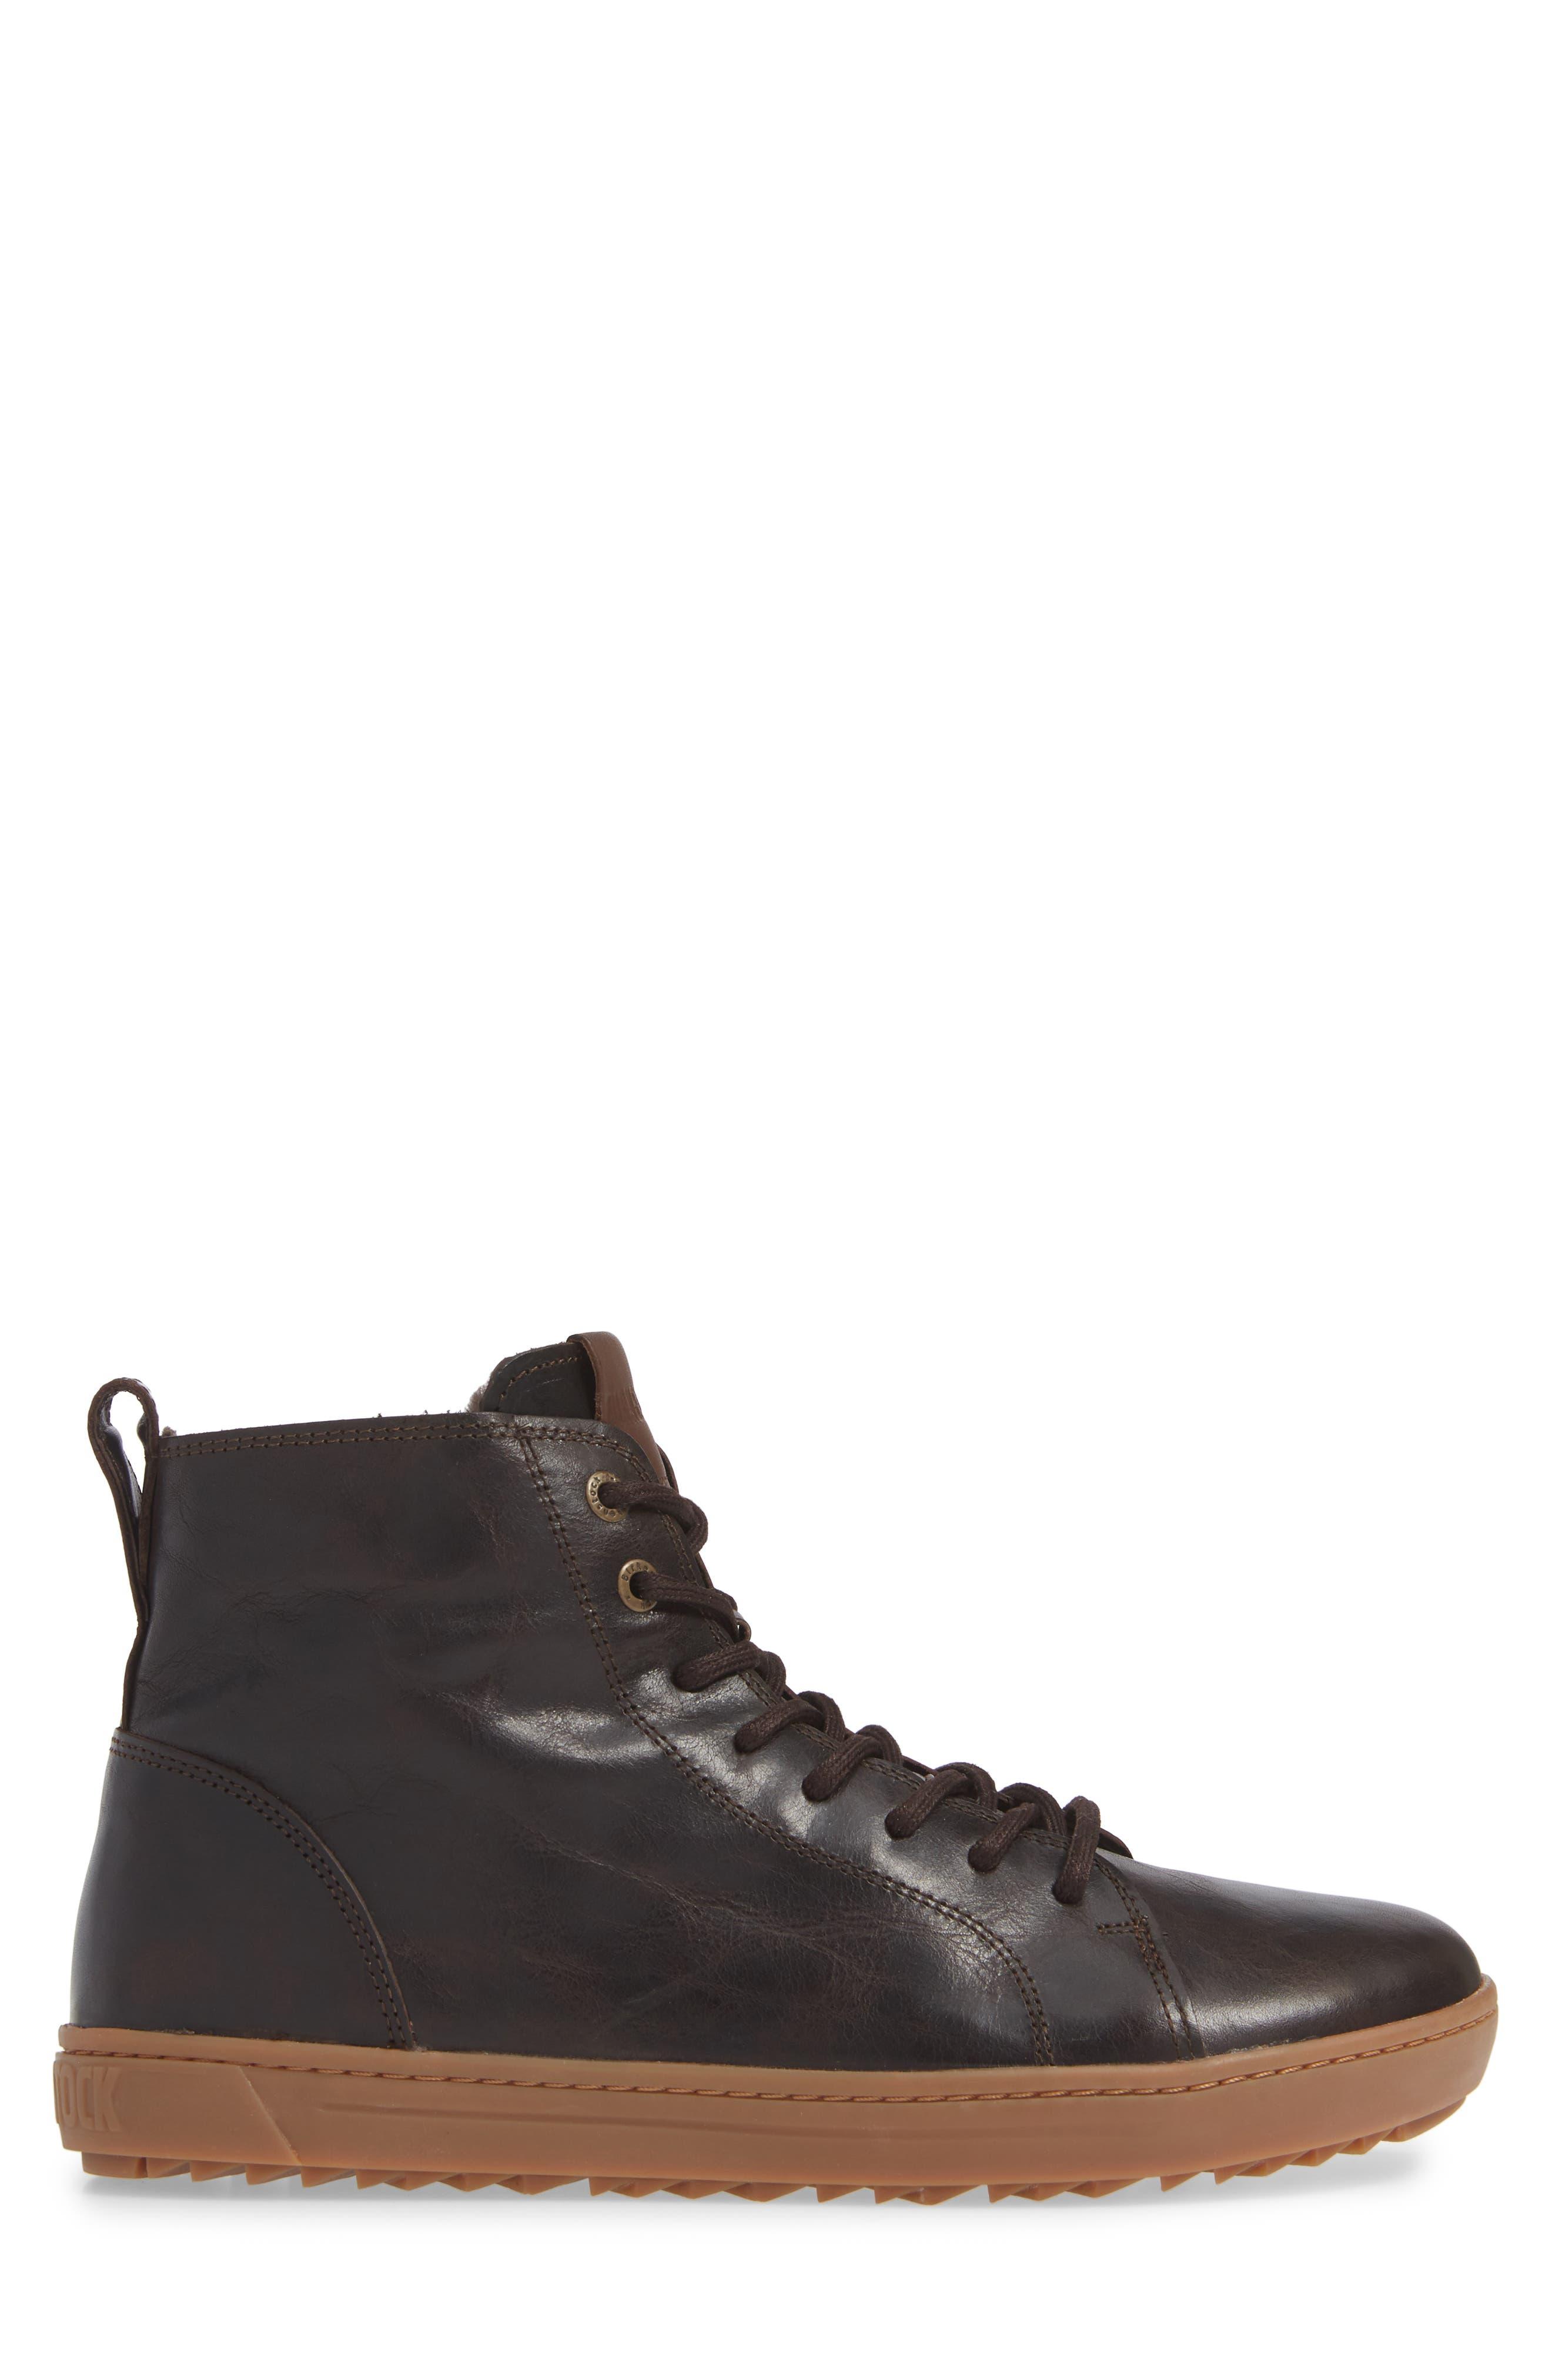 Barlett Genuine Shearling Sneaker,                             Alternate thumbnail 3, color,                             BROWN